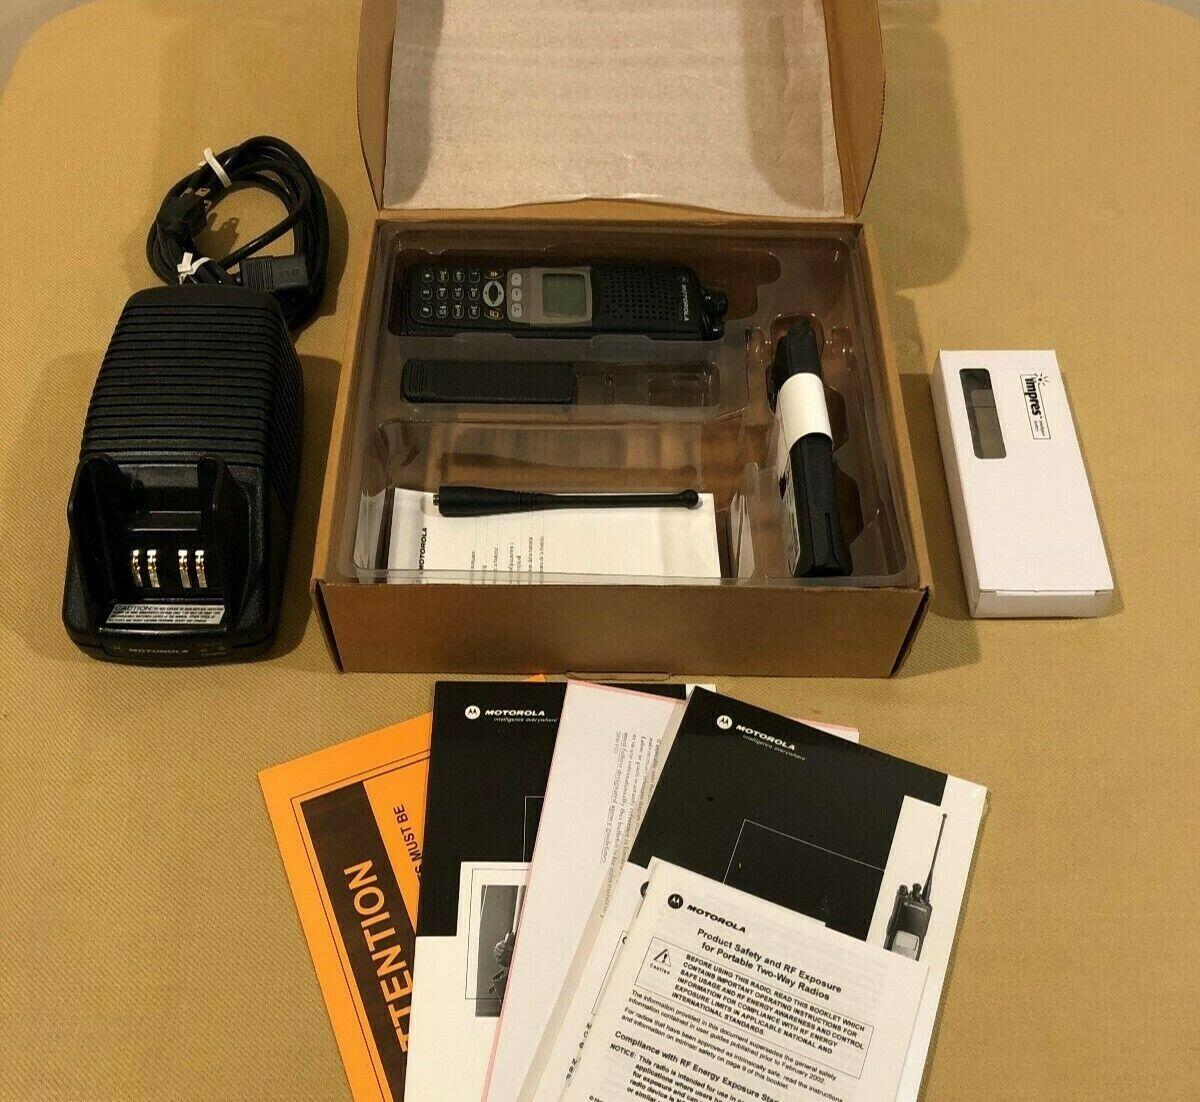 New MOTOROLA XTS5000 III UHF 380-470 MHz R1 Q-SPLIT RADIO w/ 4X ENCRYPTION . Buy it now for 499.00